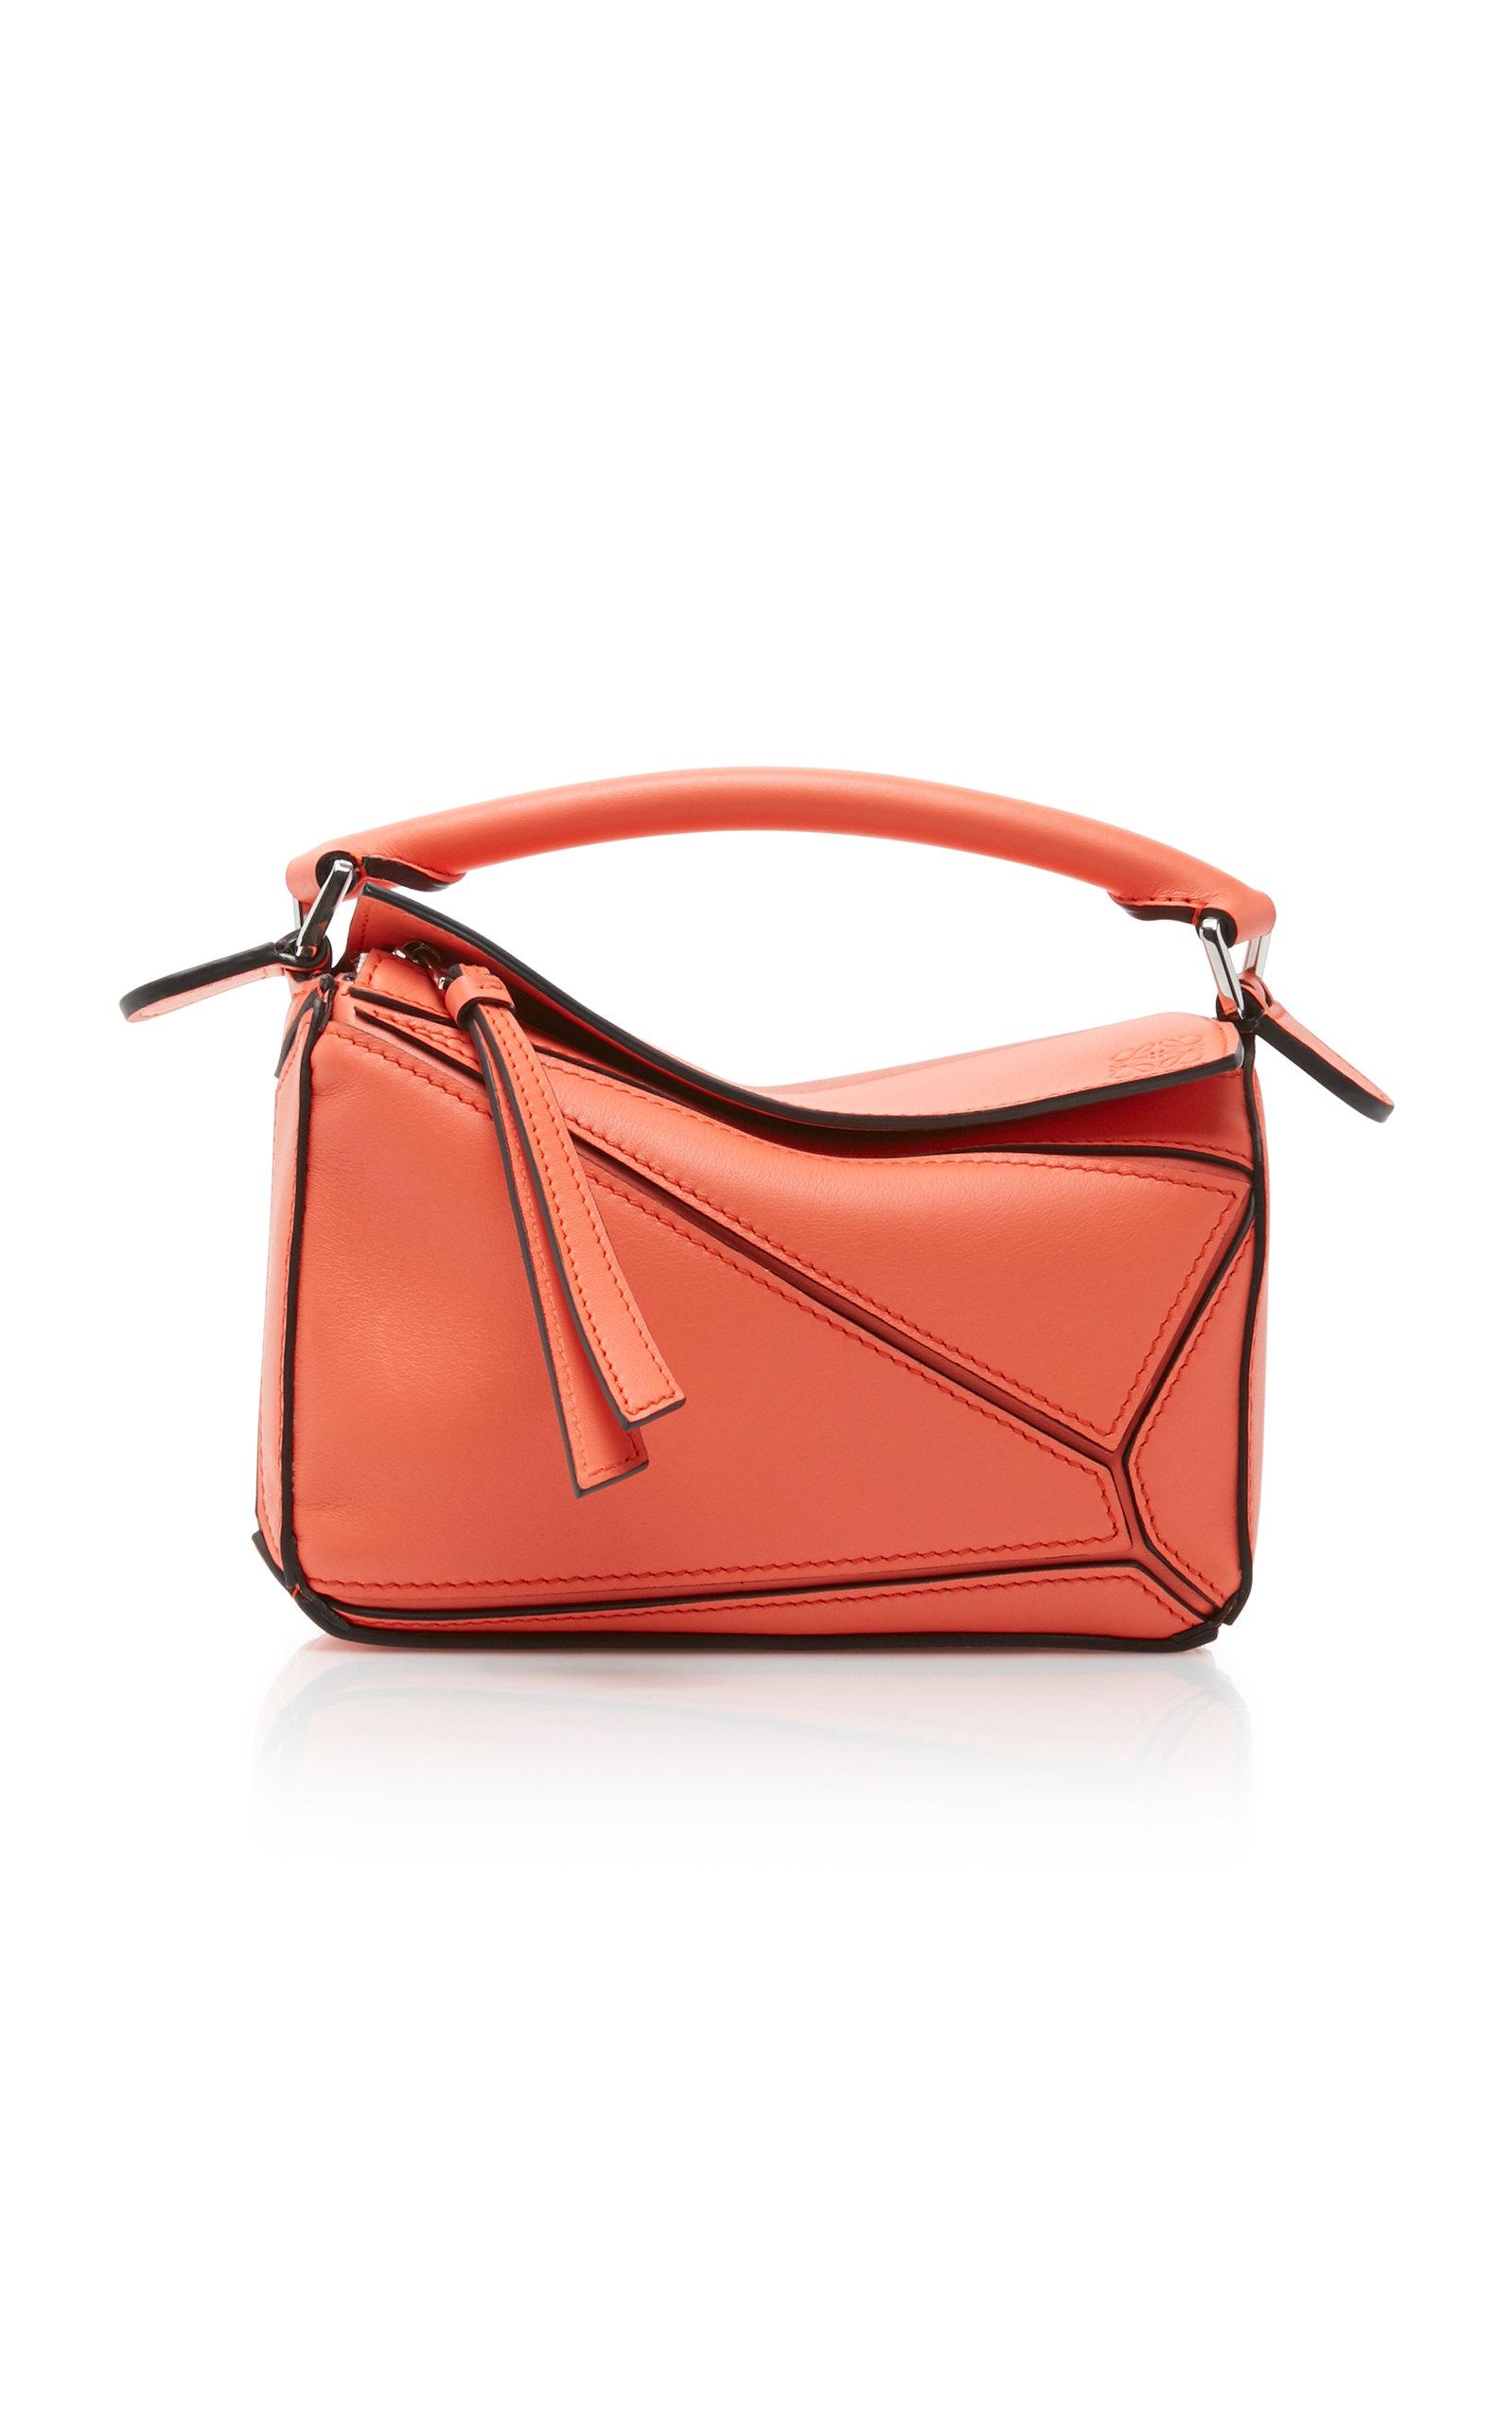 57adc9b16efd5 Puzzle Mini Leather Shoulder Bag by Loewe | Moda Operandi